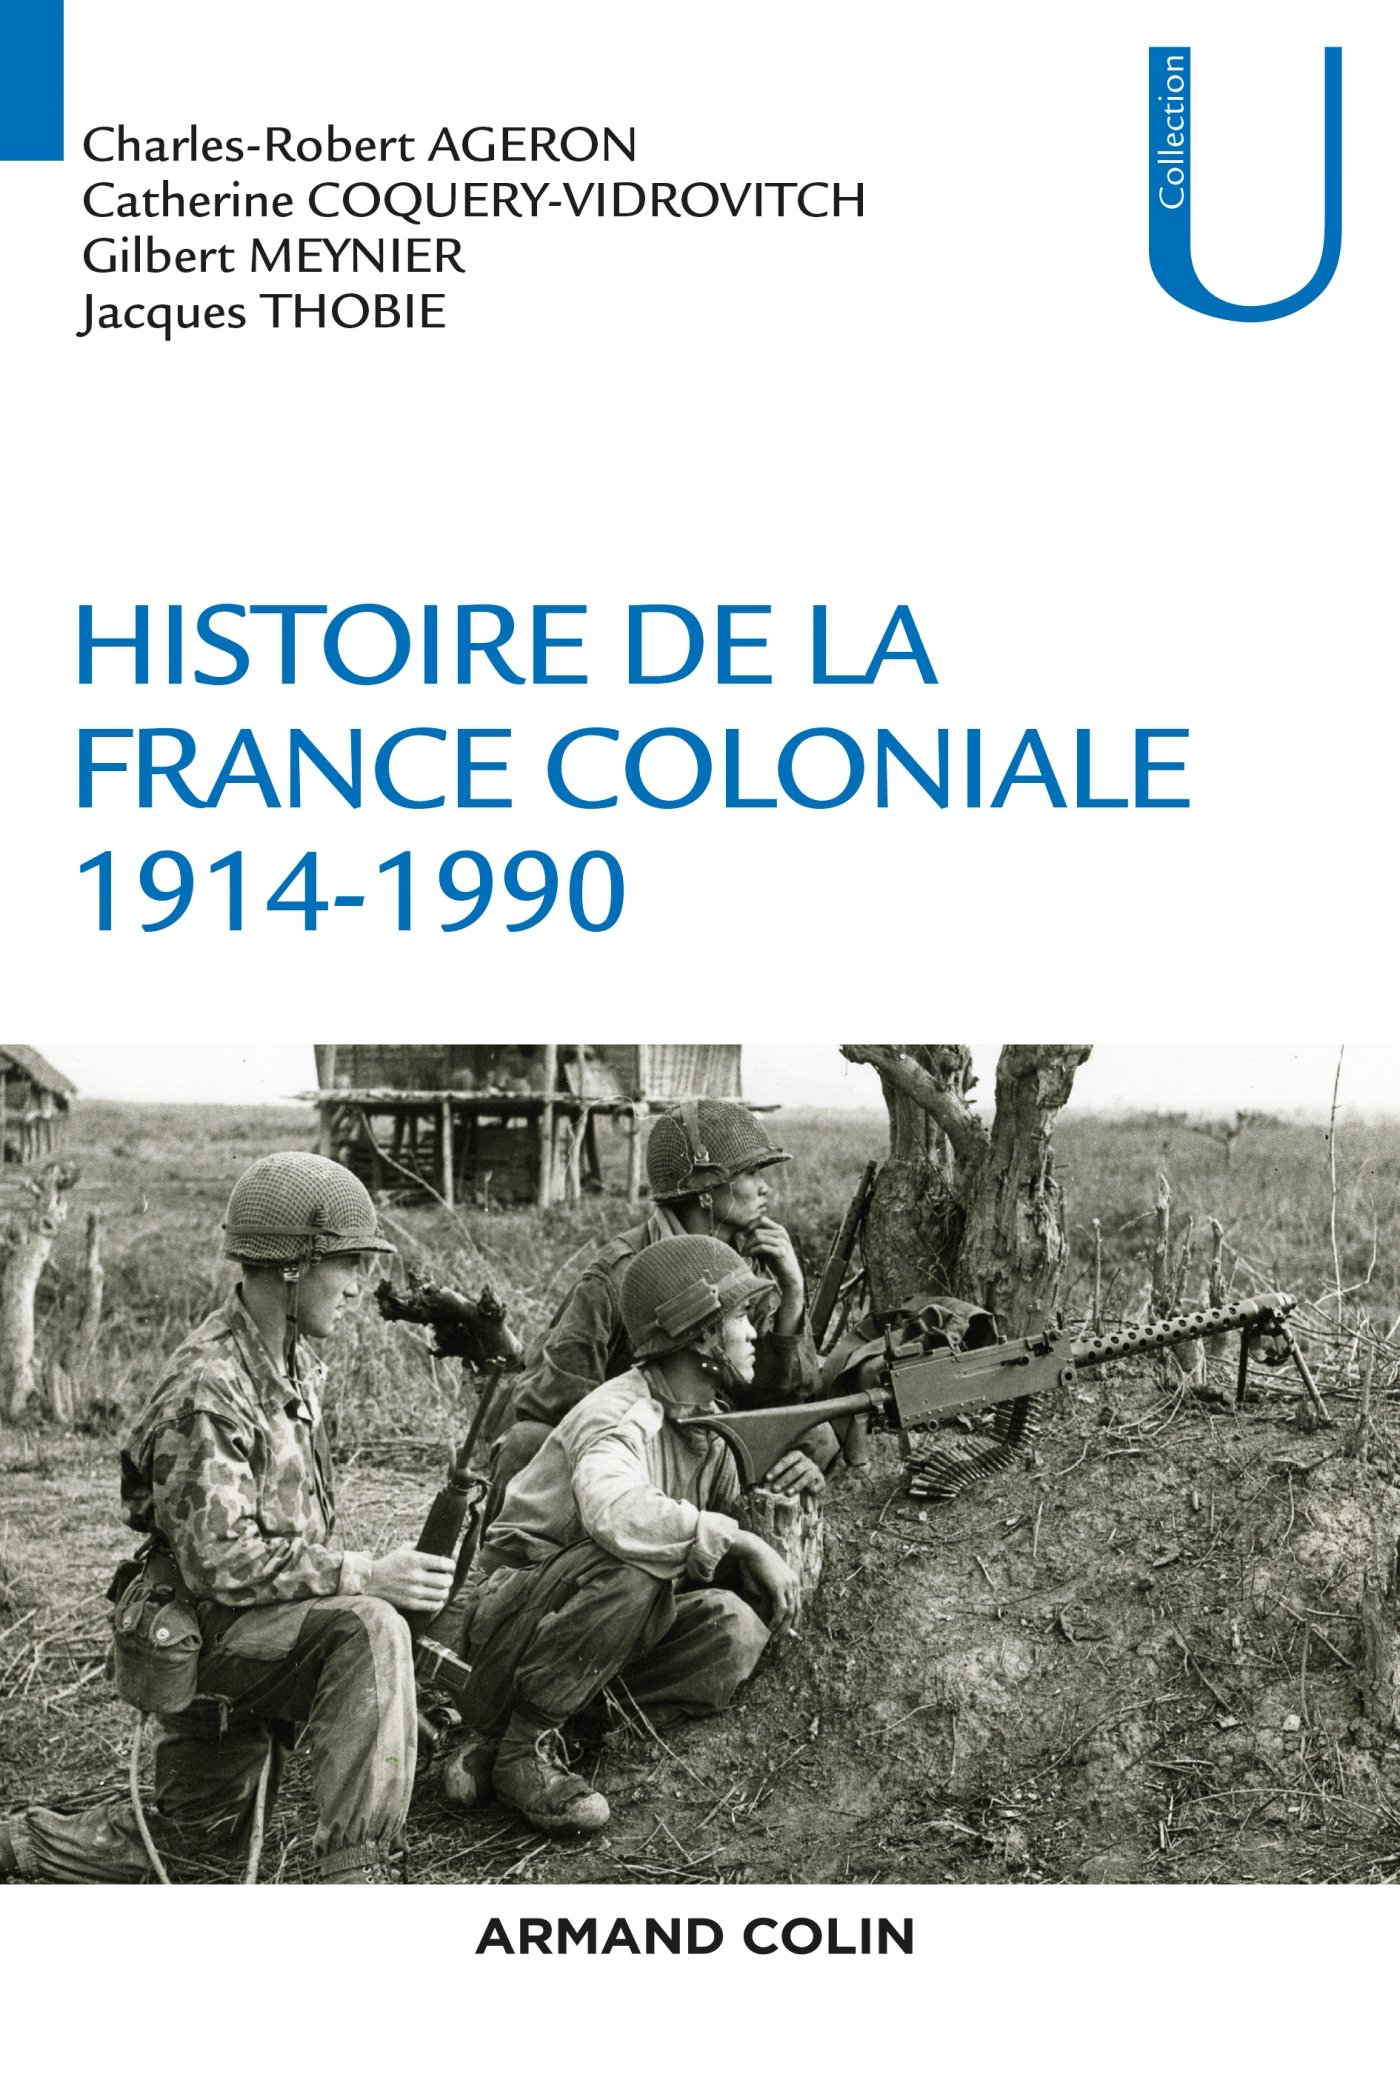 Histoire de la France coloniale - 1914-1990 Broché – 17 août 2016 Charles-Robert Ageron Catherine Coquery-Vidrovitch Gilbert Meynier Jacques Thobie